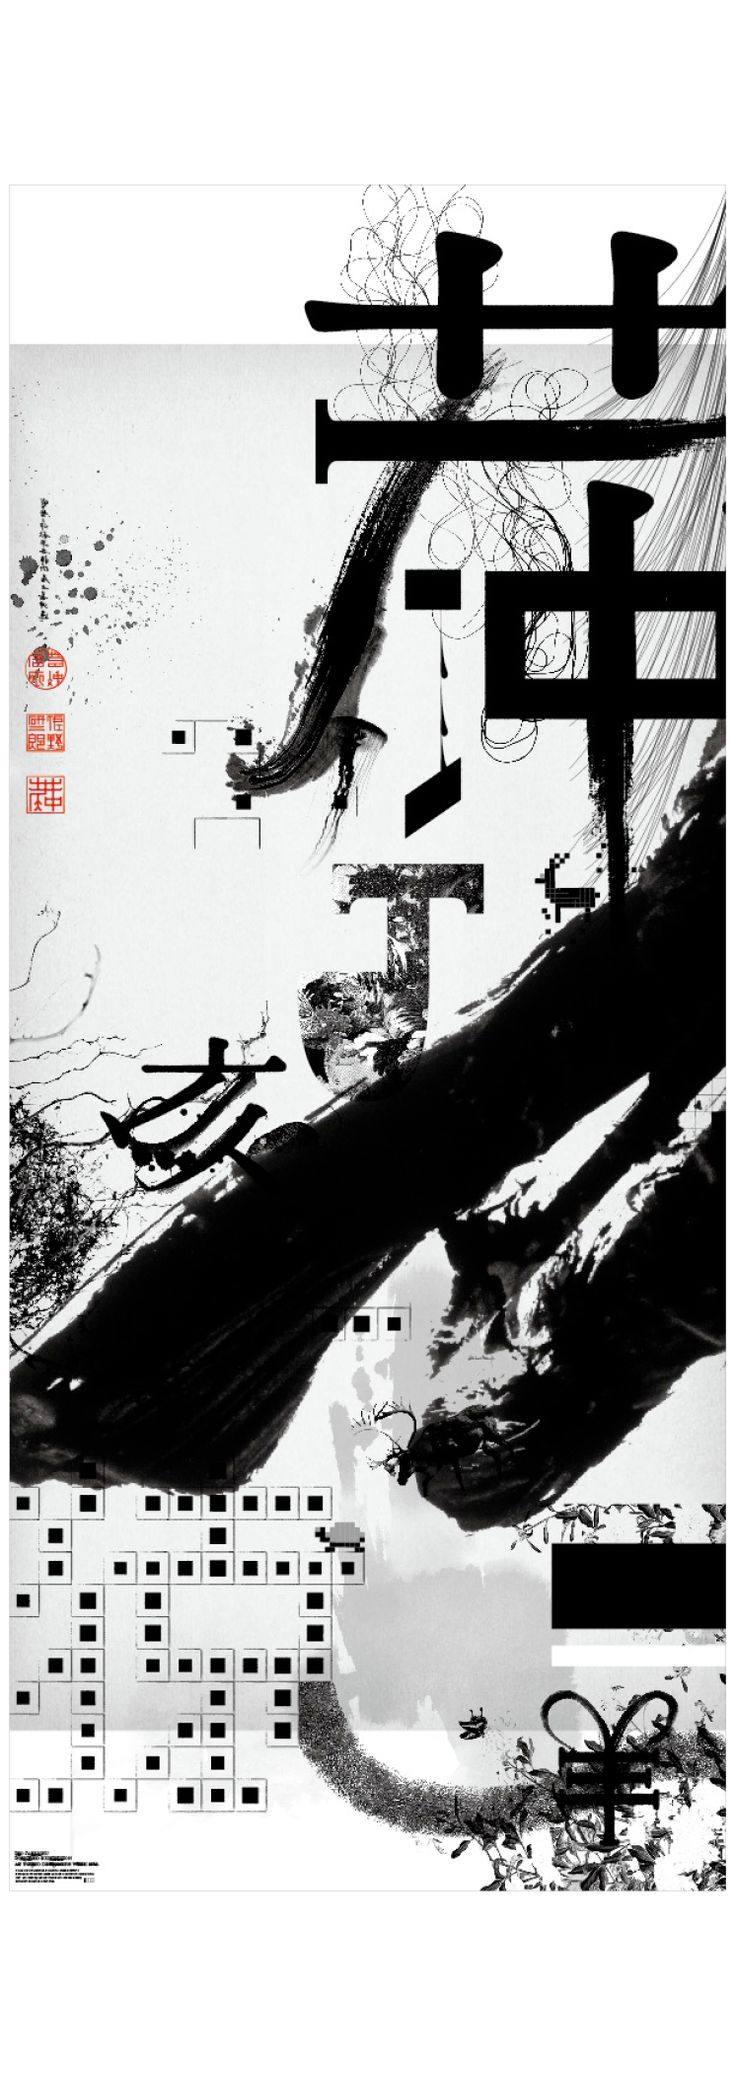 Jakuchu: Poster Design - Poster Typography // MERIT // CLIENT // Tokyo Designers Week 2012 AGENCY // Mr_Design COUNTRY: Japan // CREATIVE DIRECTOR: Kenjiro Sano // ART DIRECTOR: Kenjiro Sano // DESIGNER: Motoi Shito // - See more at: http://adcawards.org/winners#sthash.g7rN5bQ6.dpuf